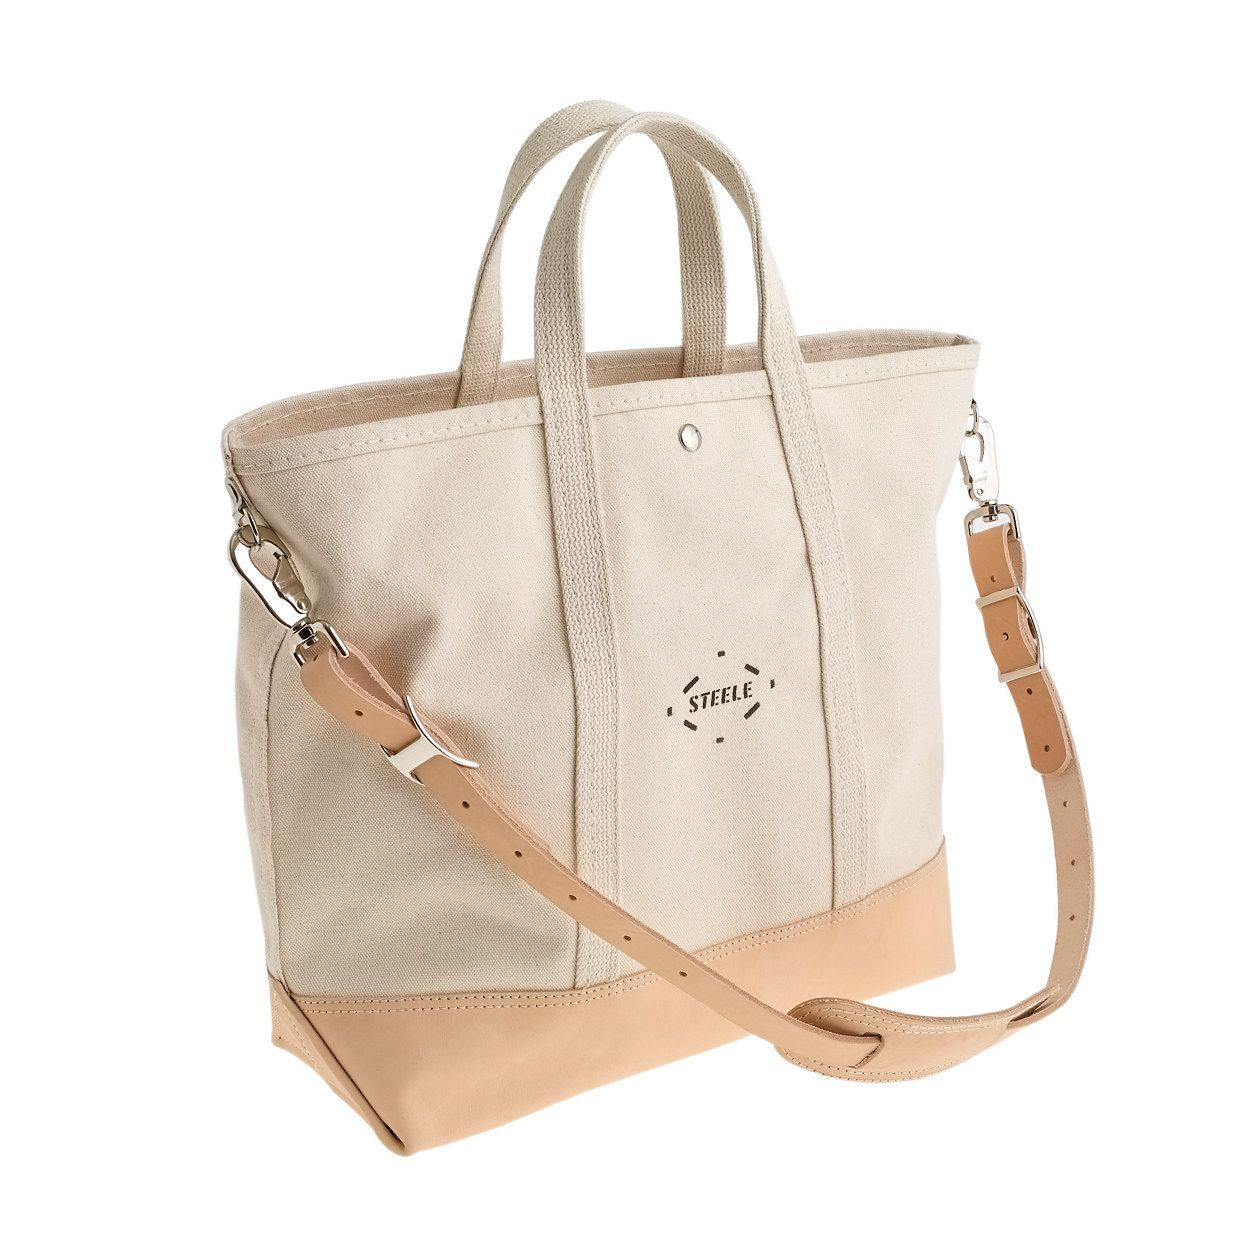 Steele Canvas Basket Corp.™ for J.Crew coal bag : bags | J.Crew